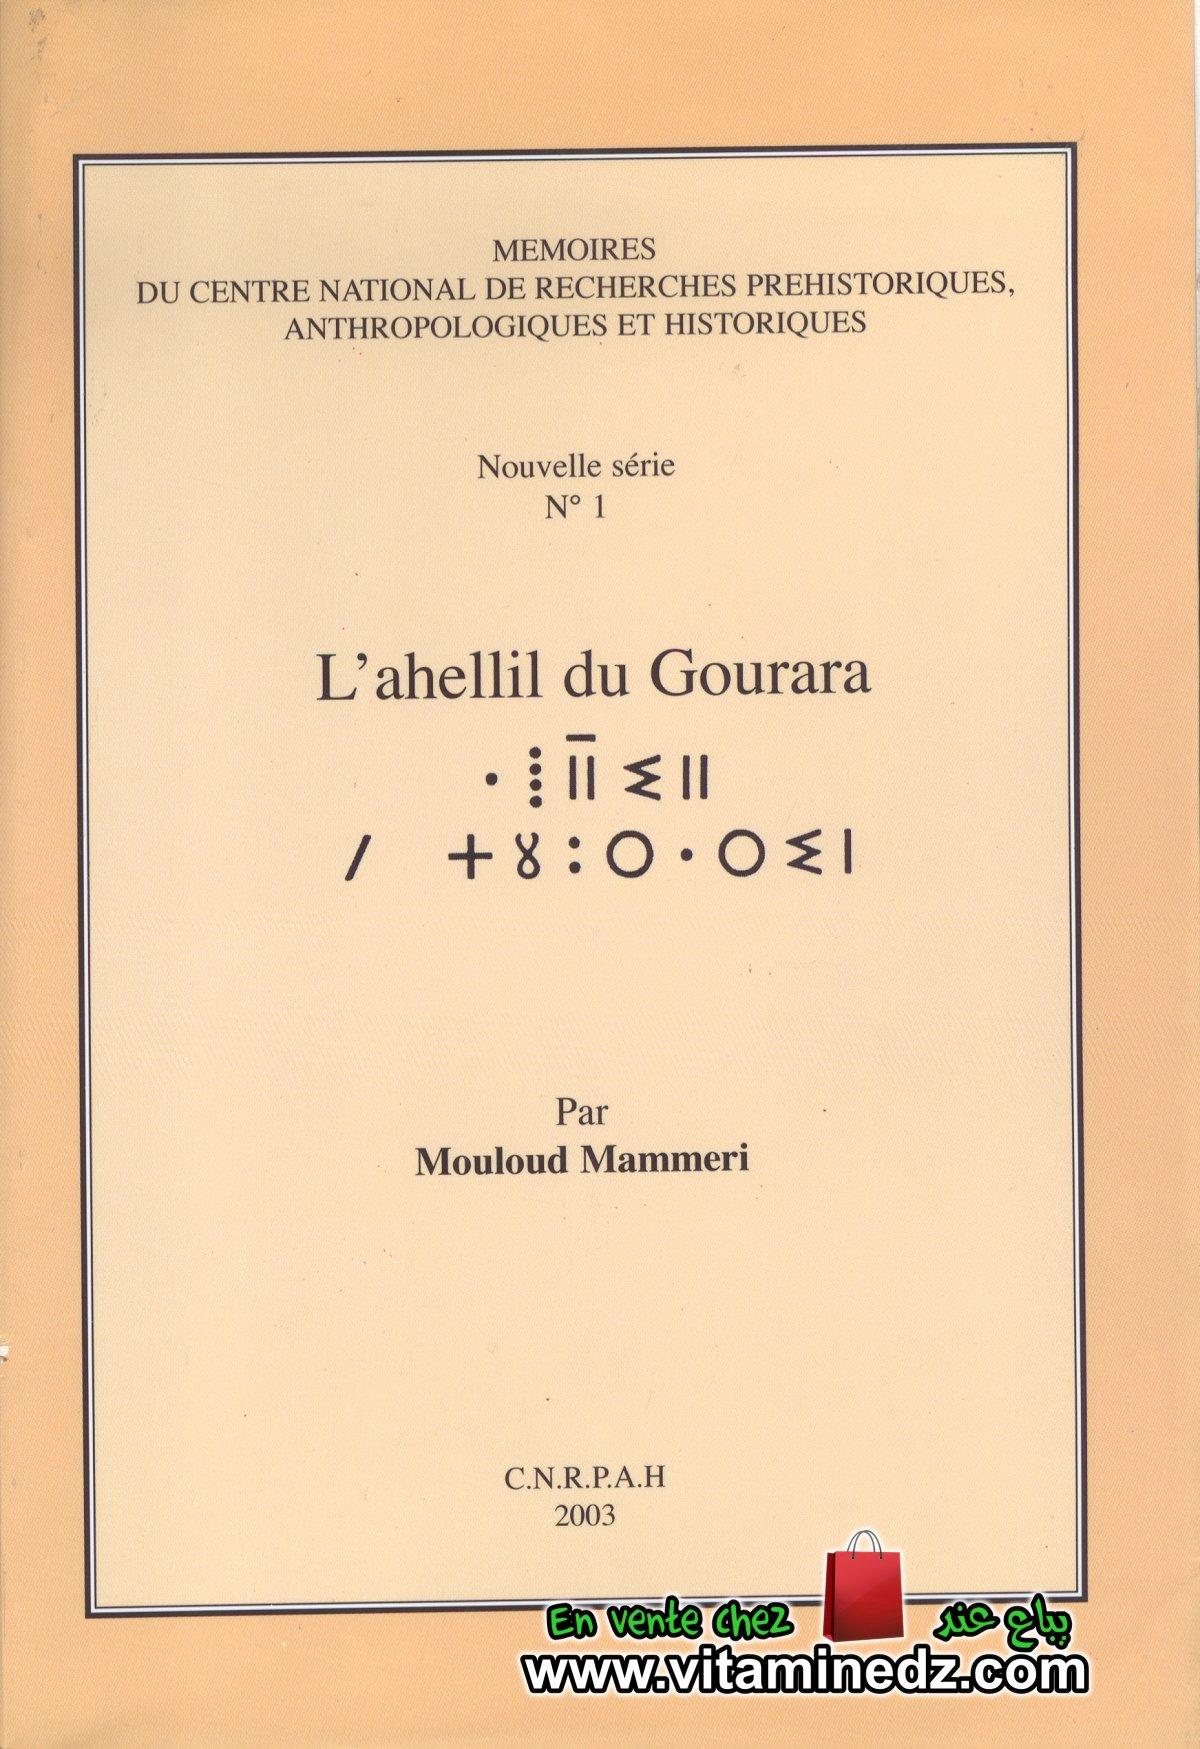 Mouloud Mammeri - L'ahellil du Gourara (2003)